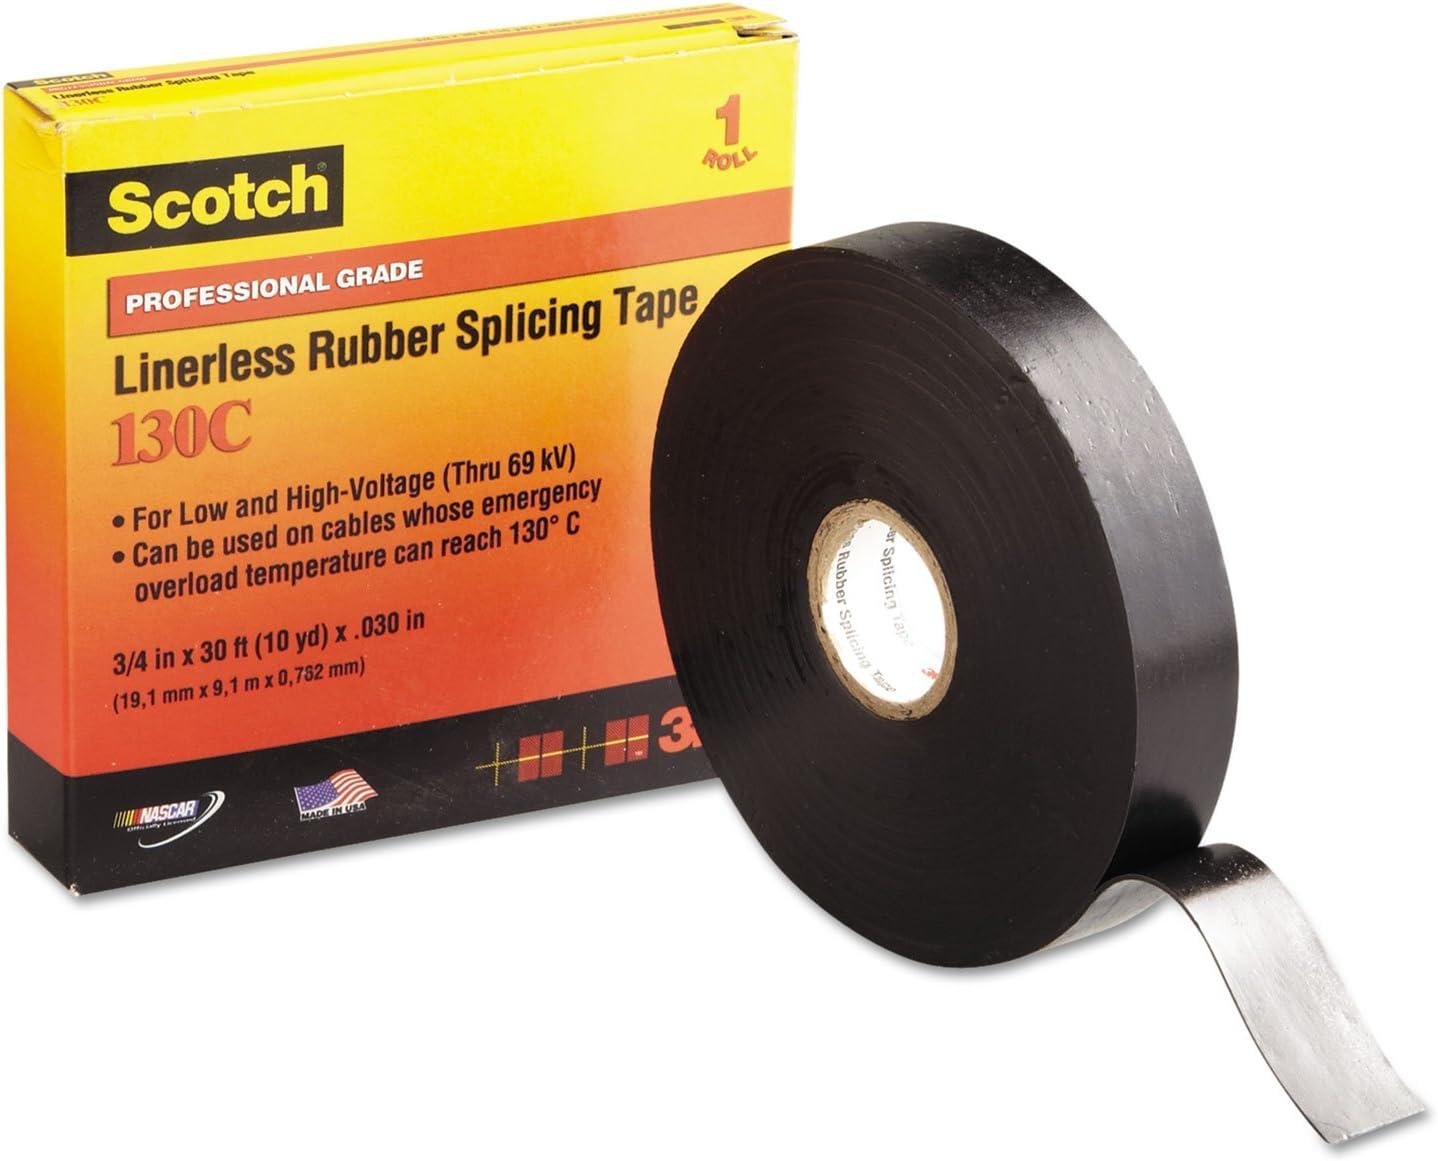 Scotch® Linerless Rubber Splicing Tape 130C 1 in x 30 ft Black